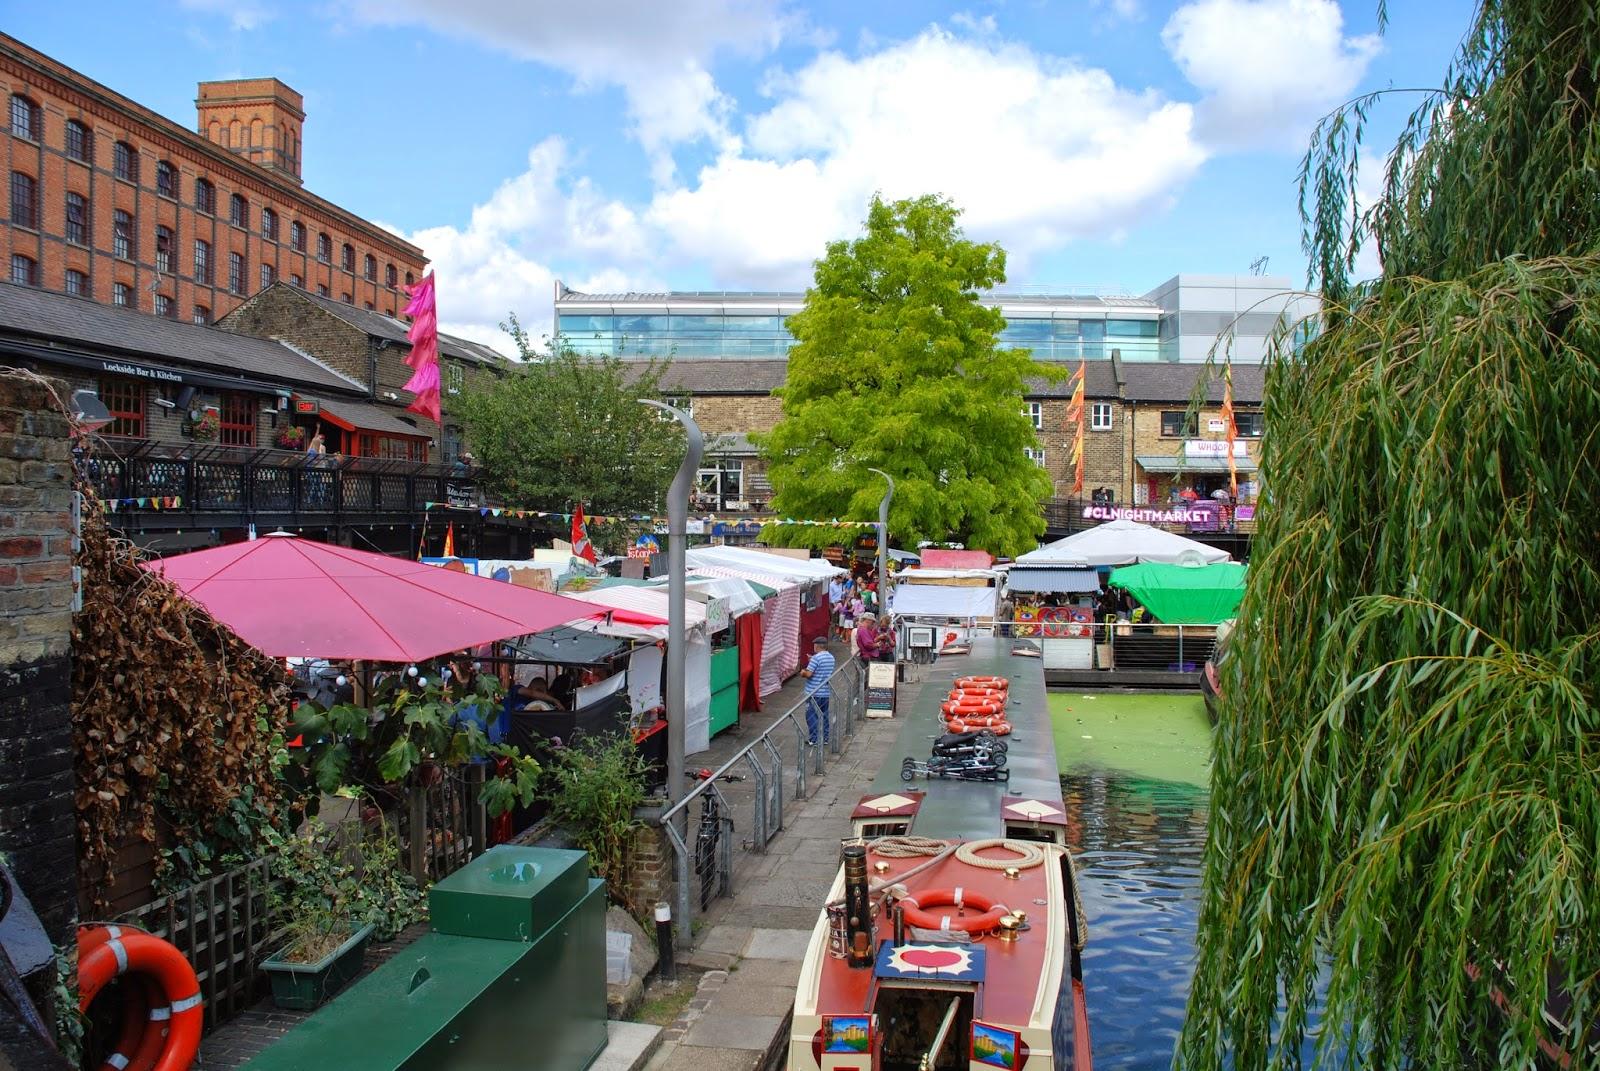 Camden Lock,Regent's Canal, London